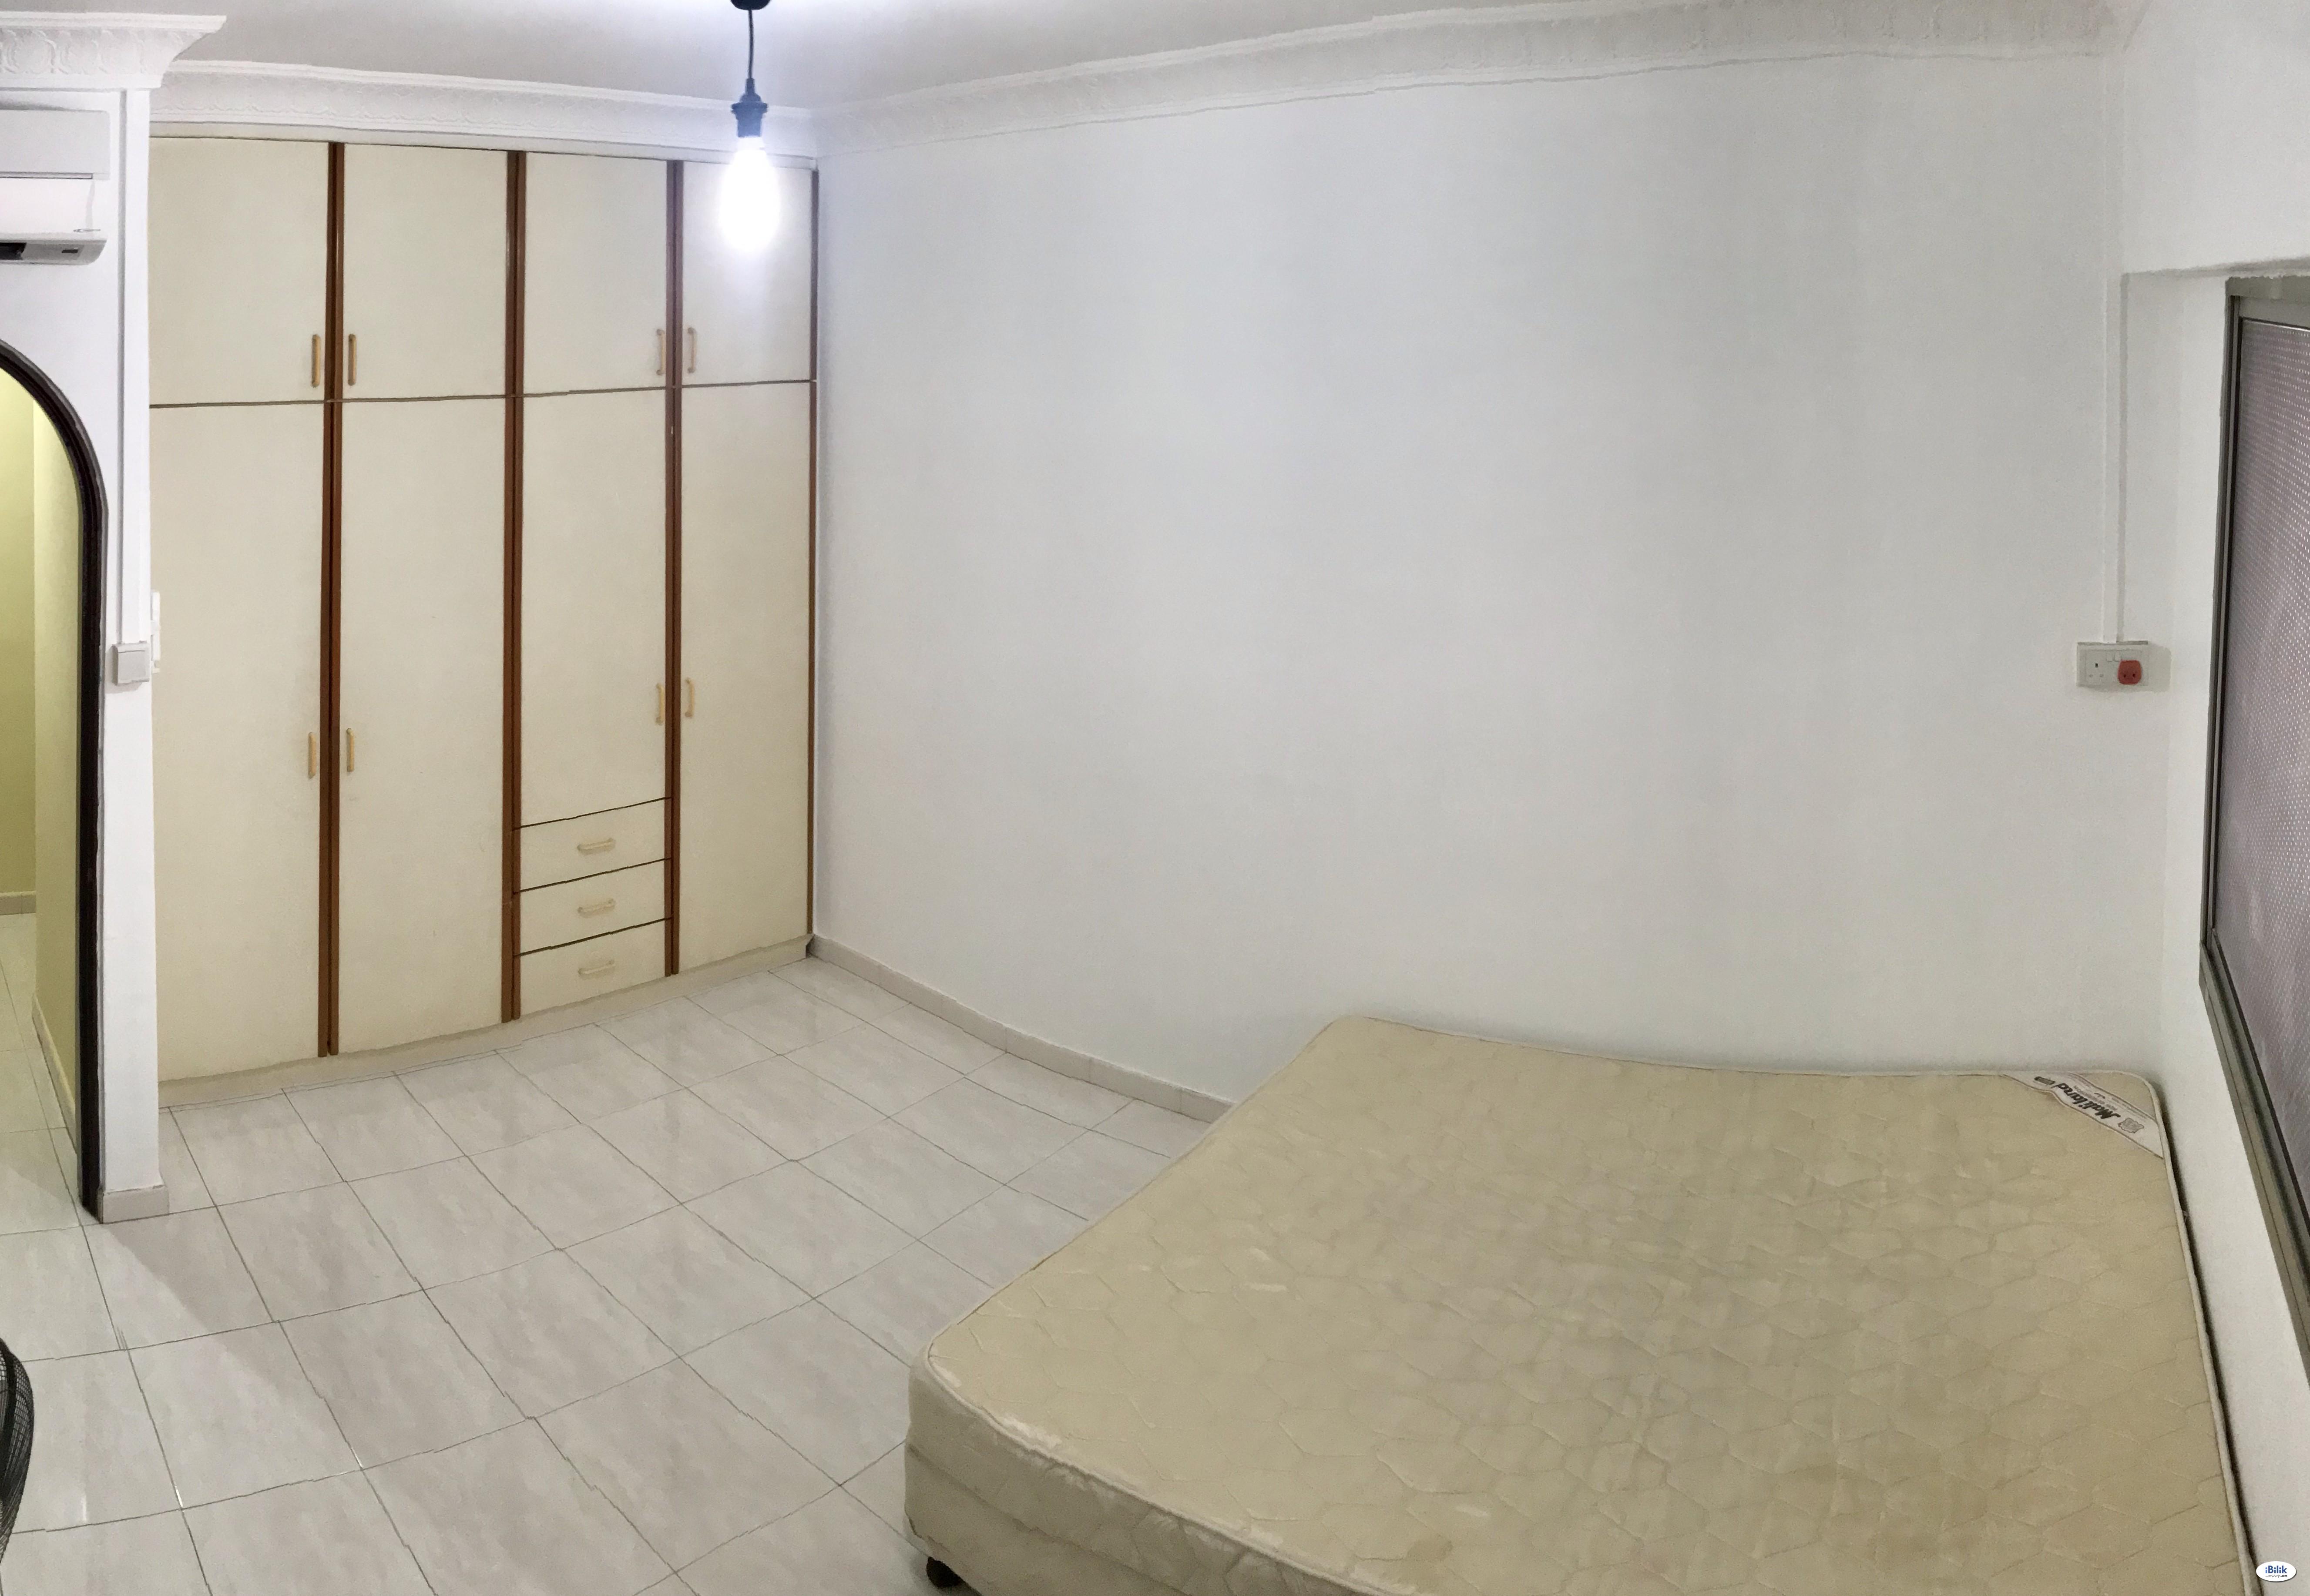 Single Room at Blk 8 Toh Yi Drive, Beauty World MRT